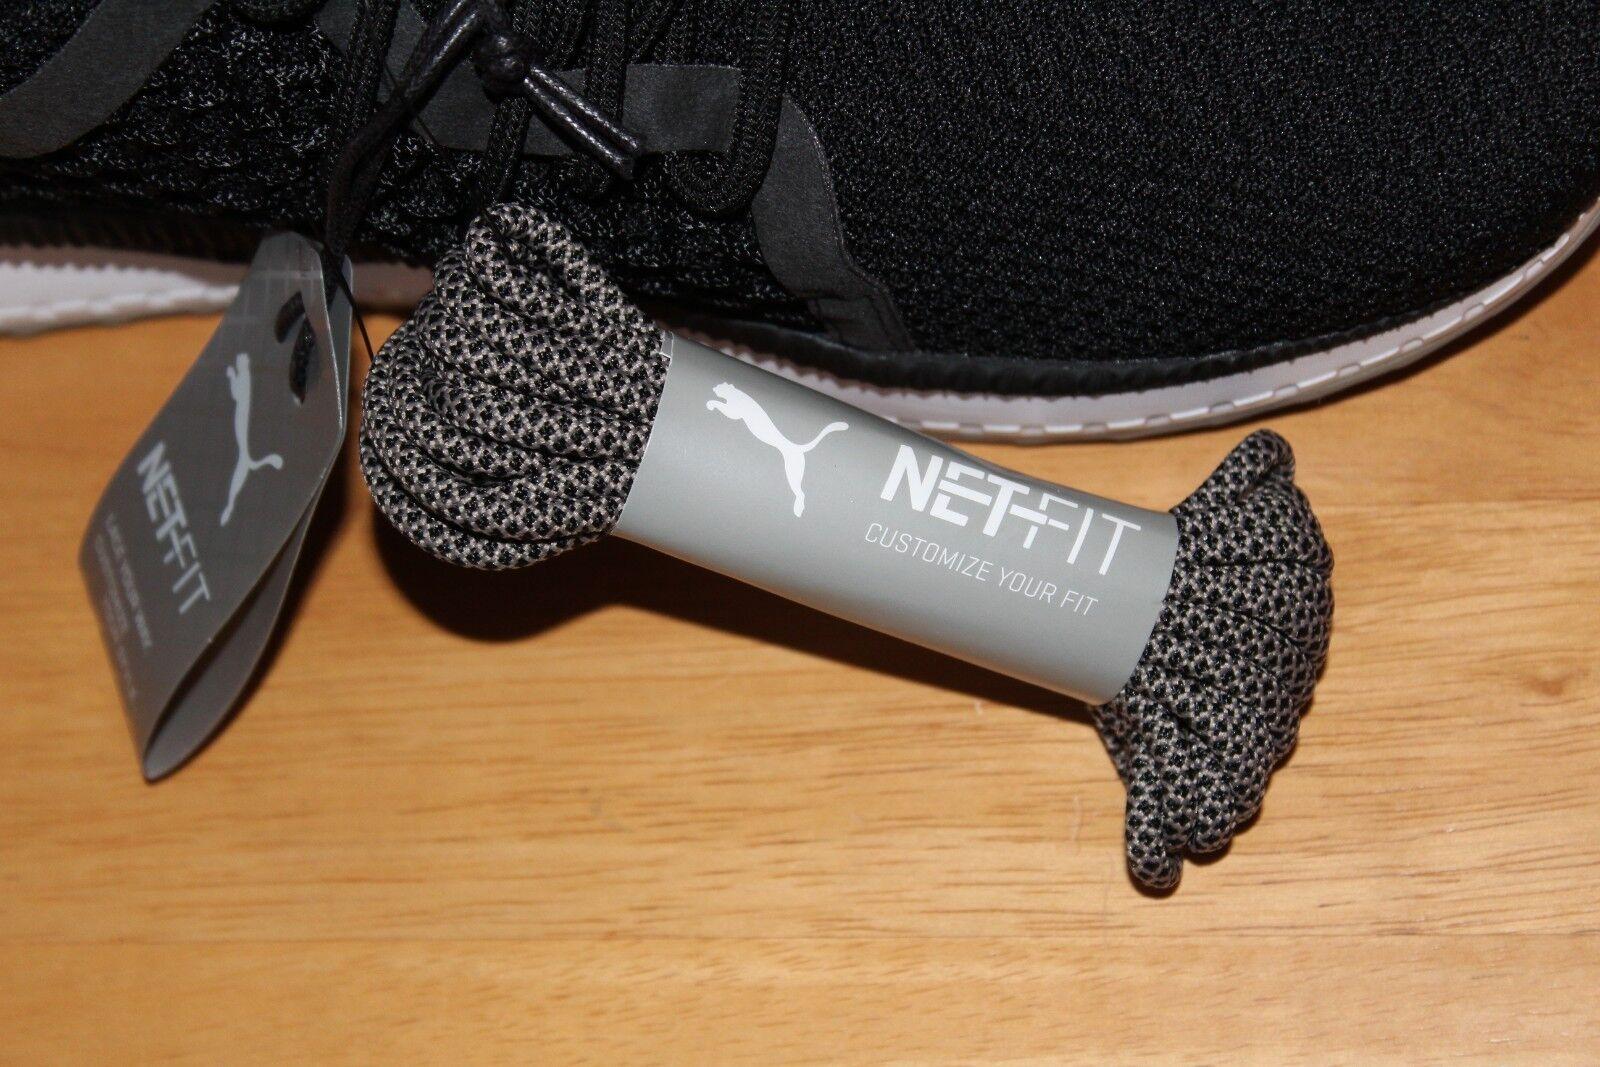 Puma tsugi nero bianca Rock Ridge Scarpe Scarpe Scarpe da ginnastica Uomo 364629 08 | Costi medi  | Uomo/Donne Scarpa  fbe1a6